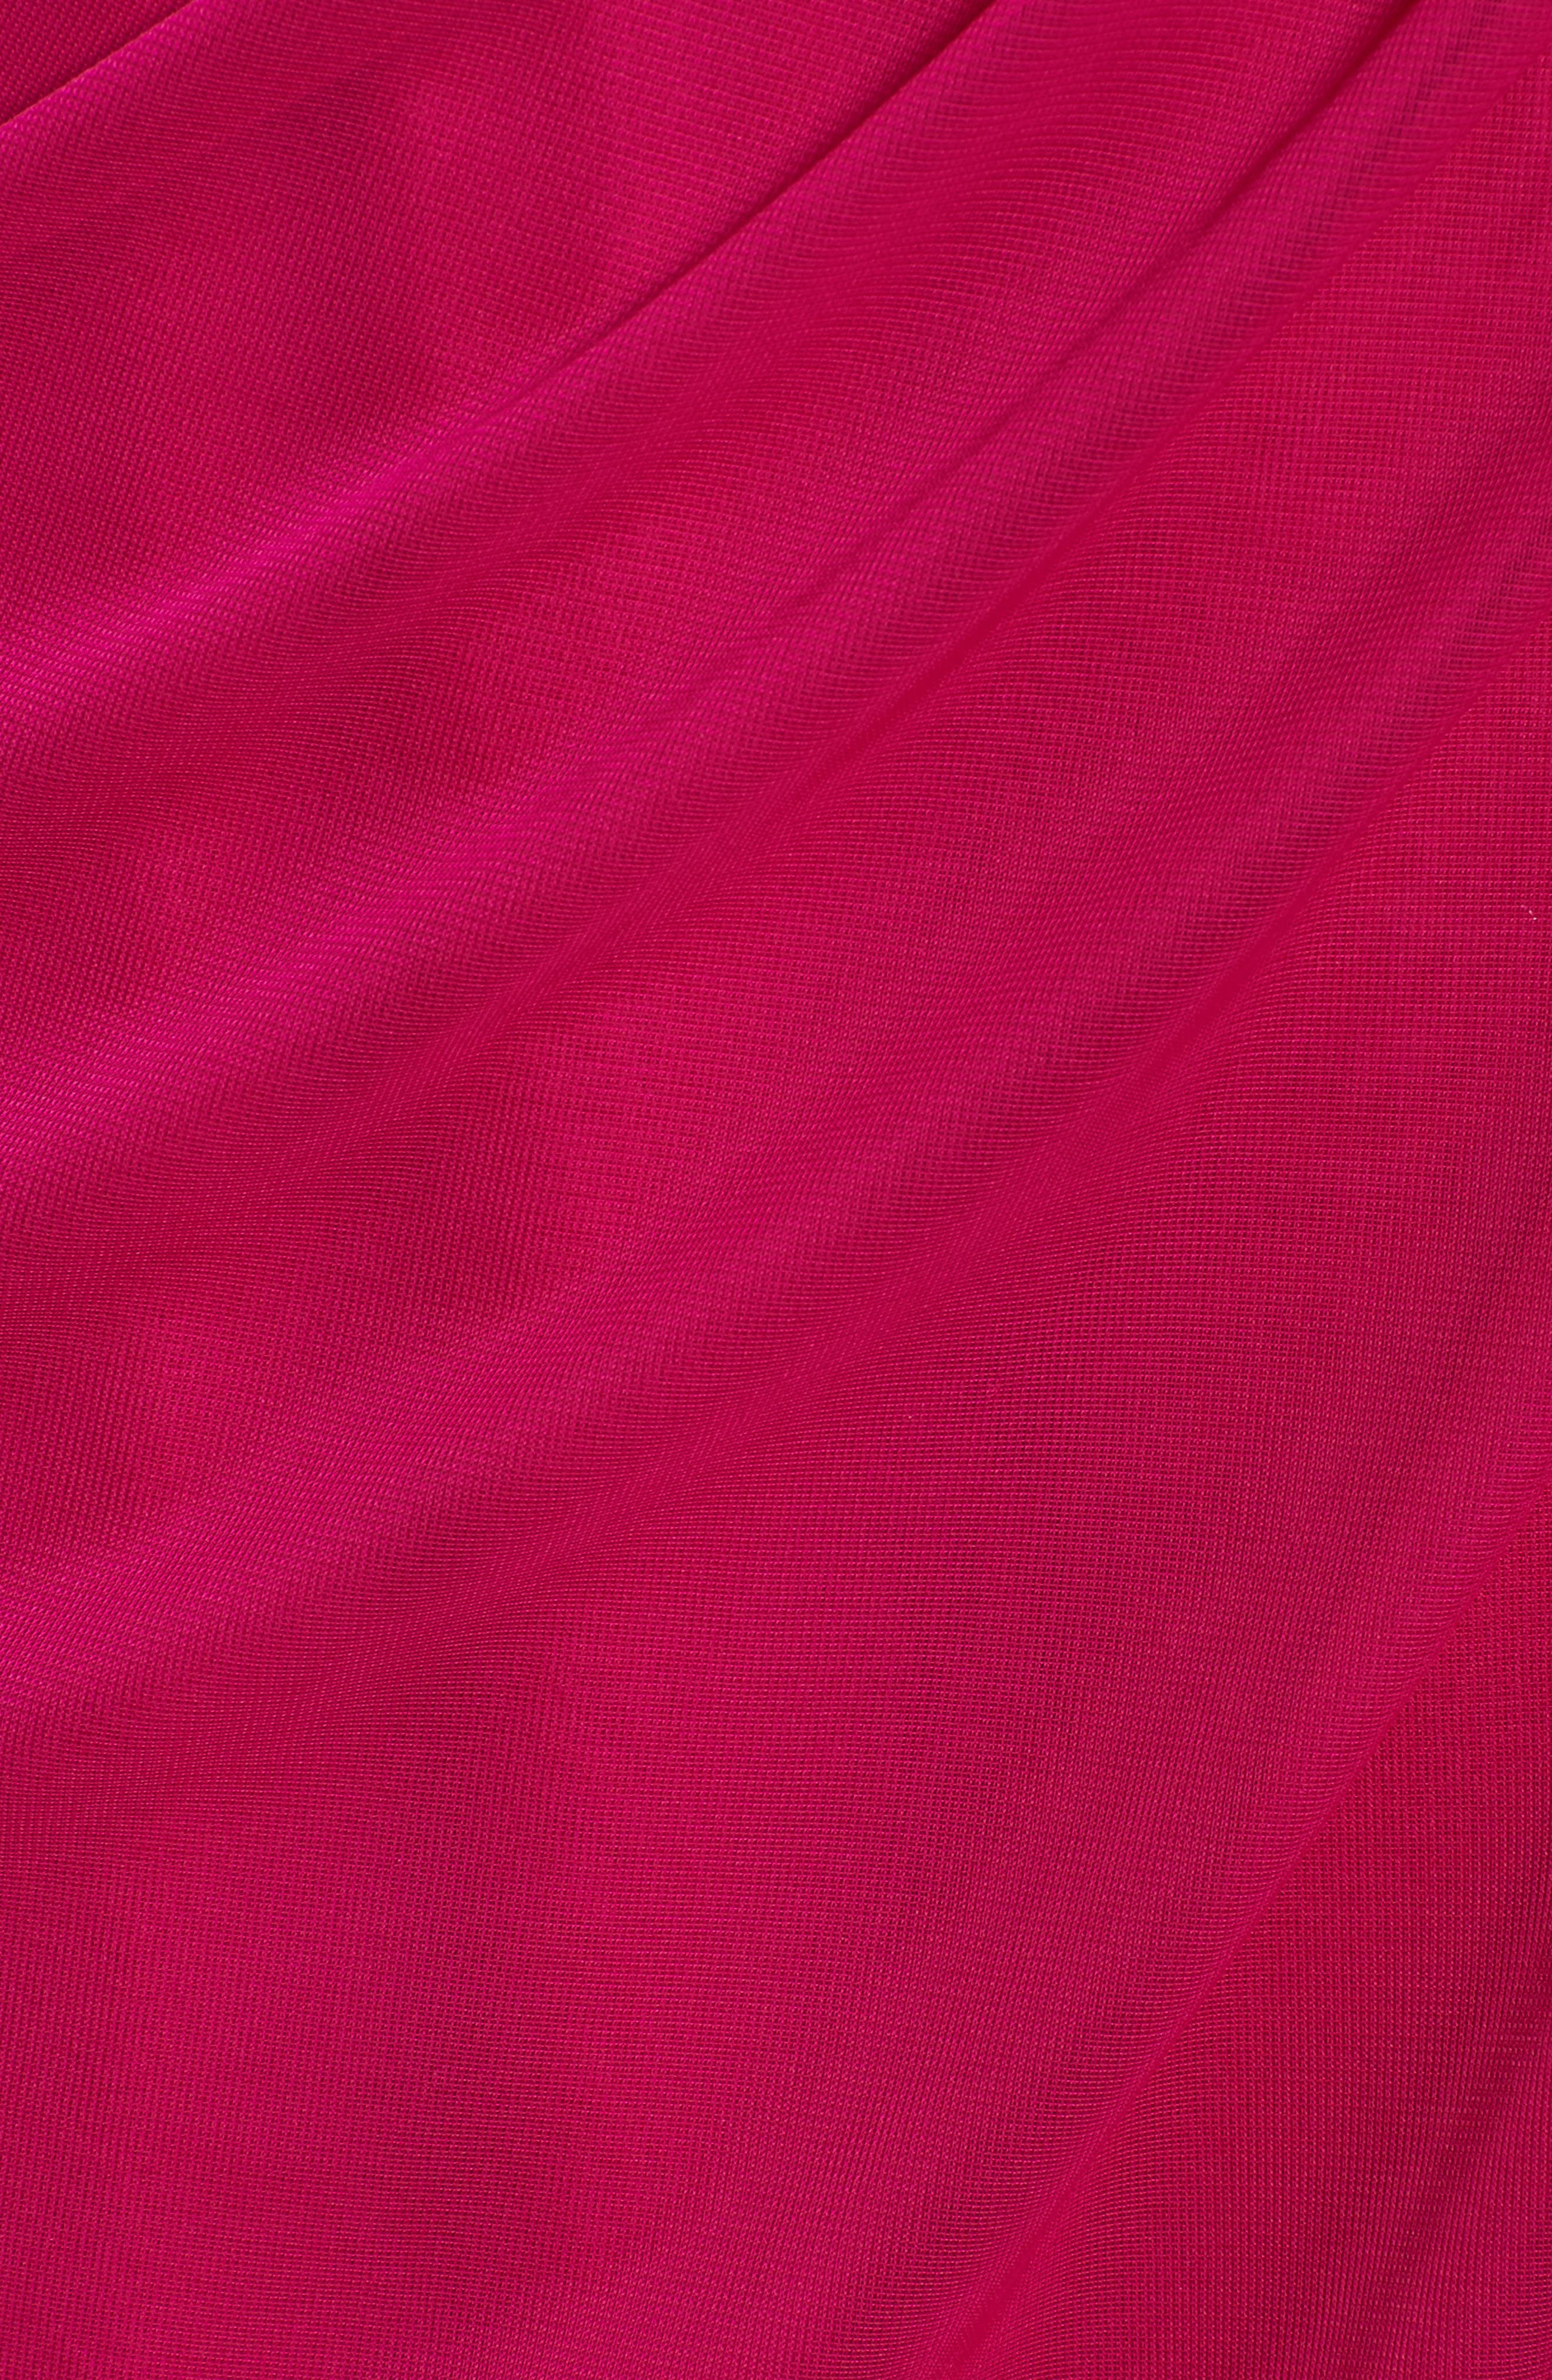 Alternate Image 5  - Alex Evenings Embellished Off the Shoulder Gown (Plus Size)